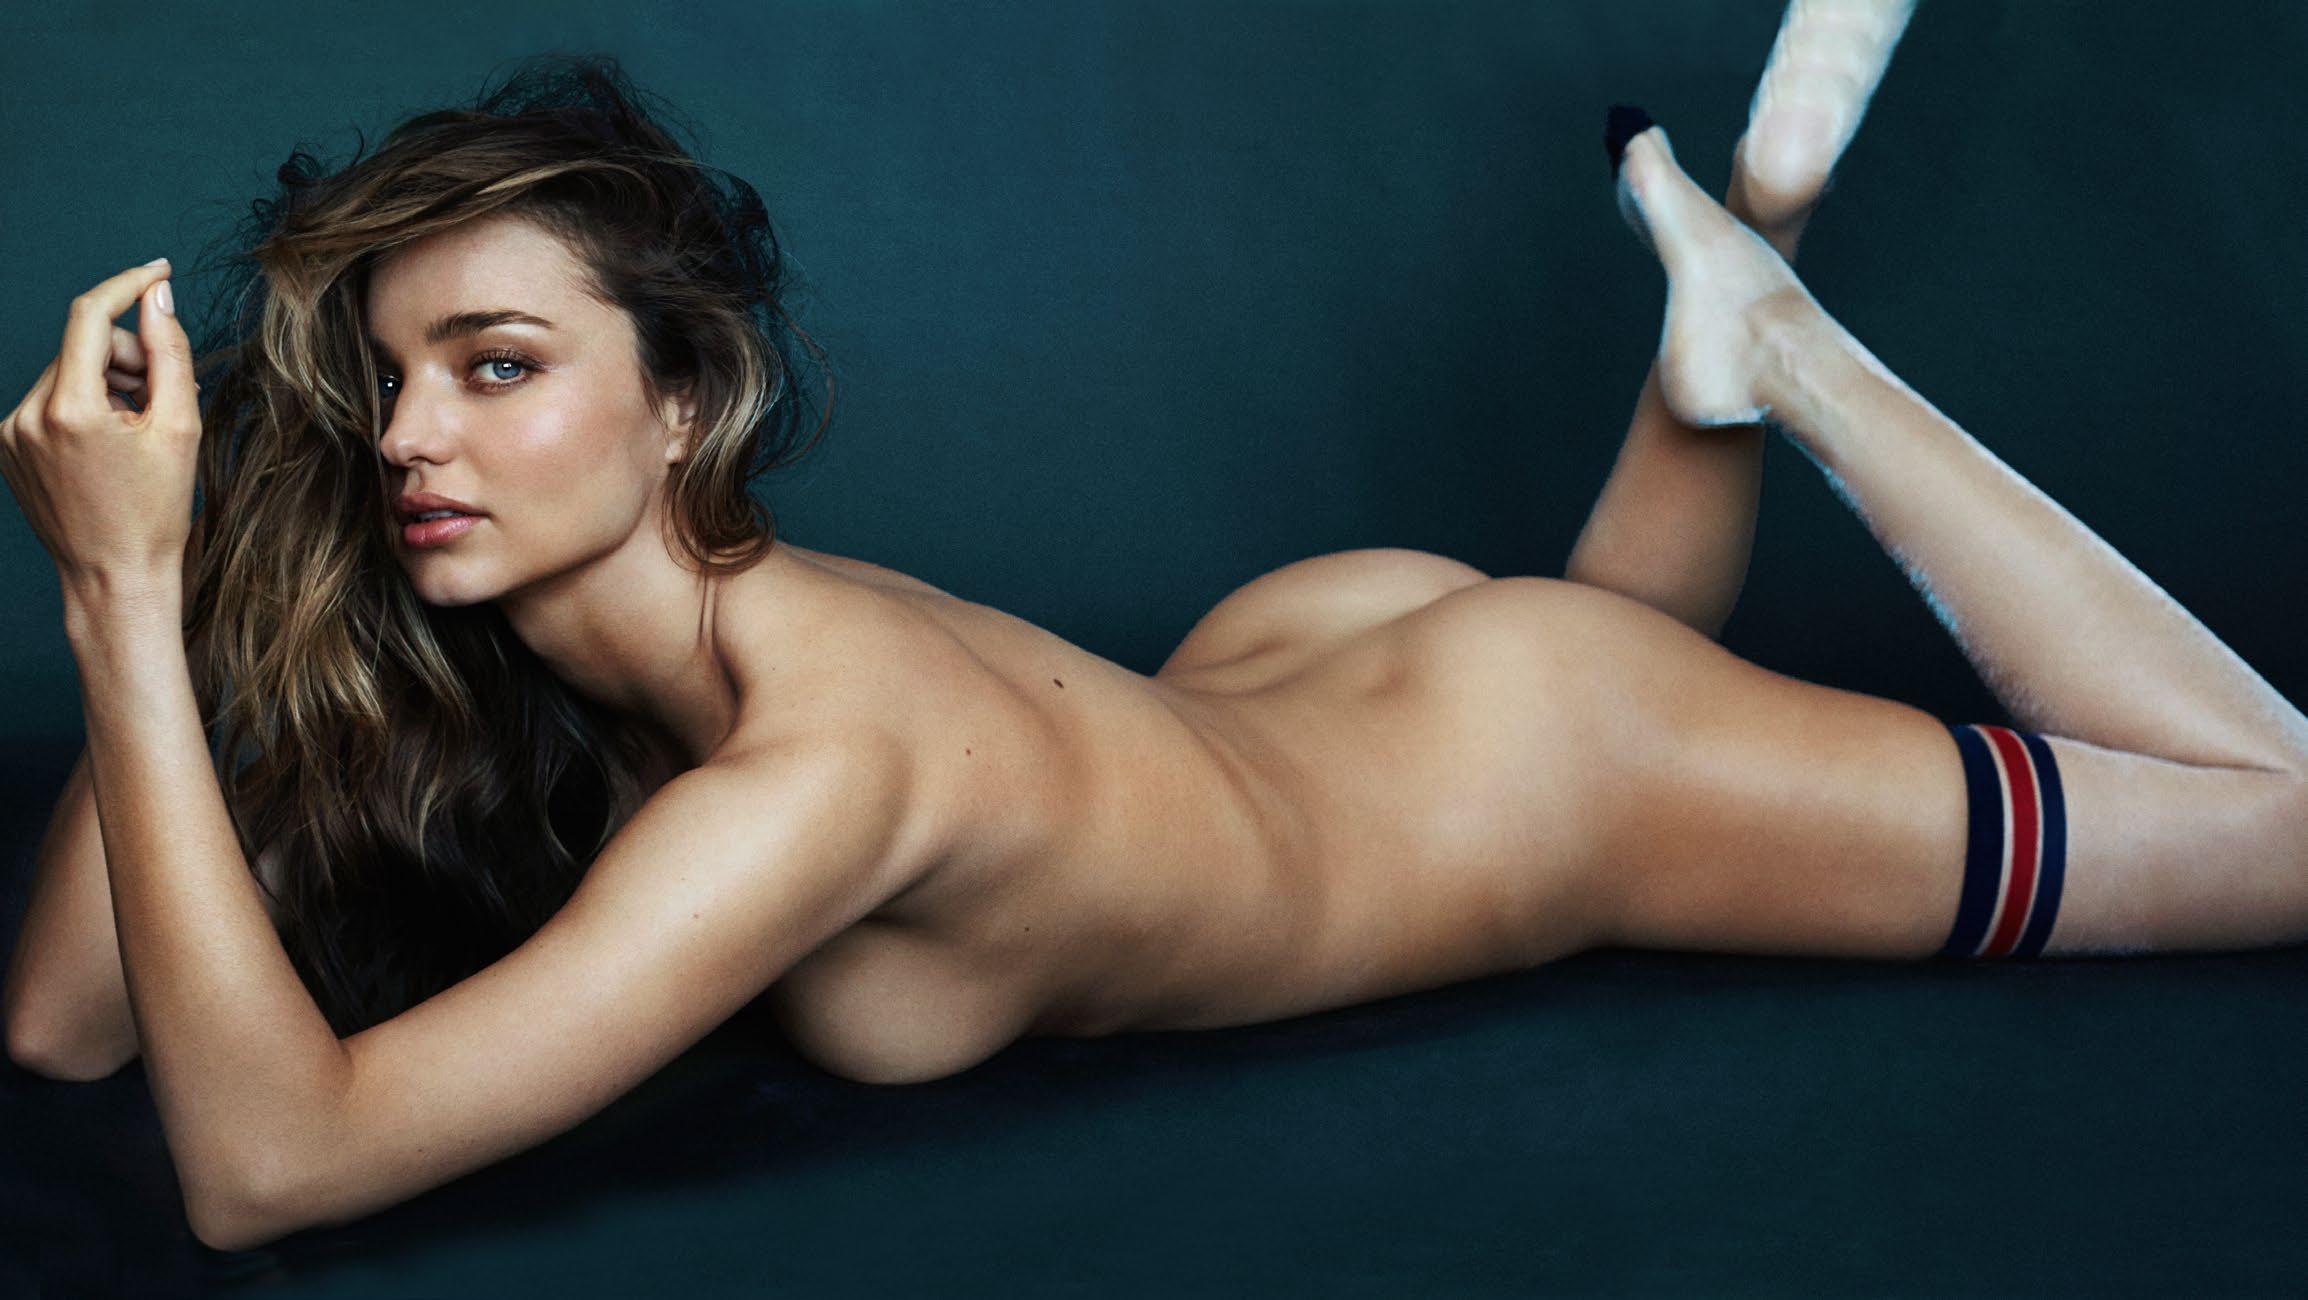 Fucking nude secret victoria models